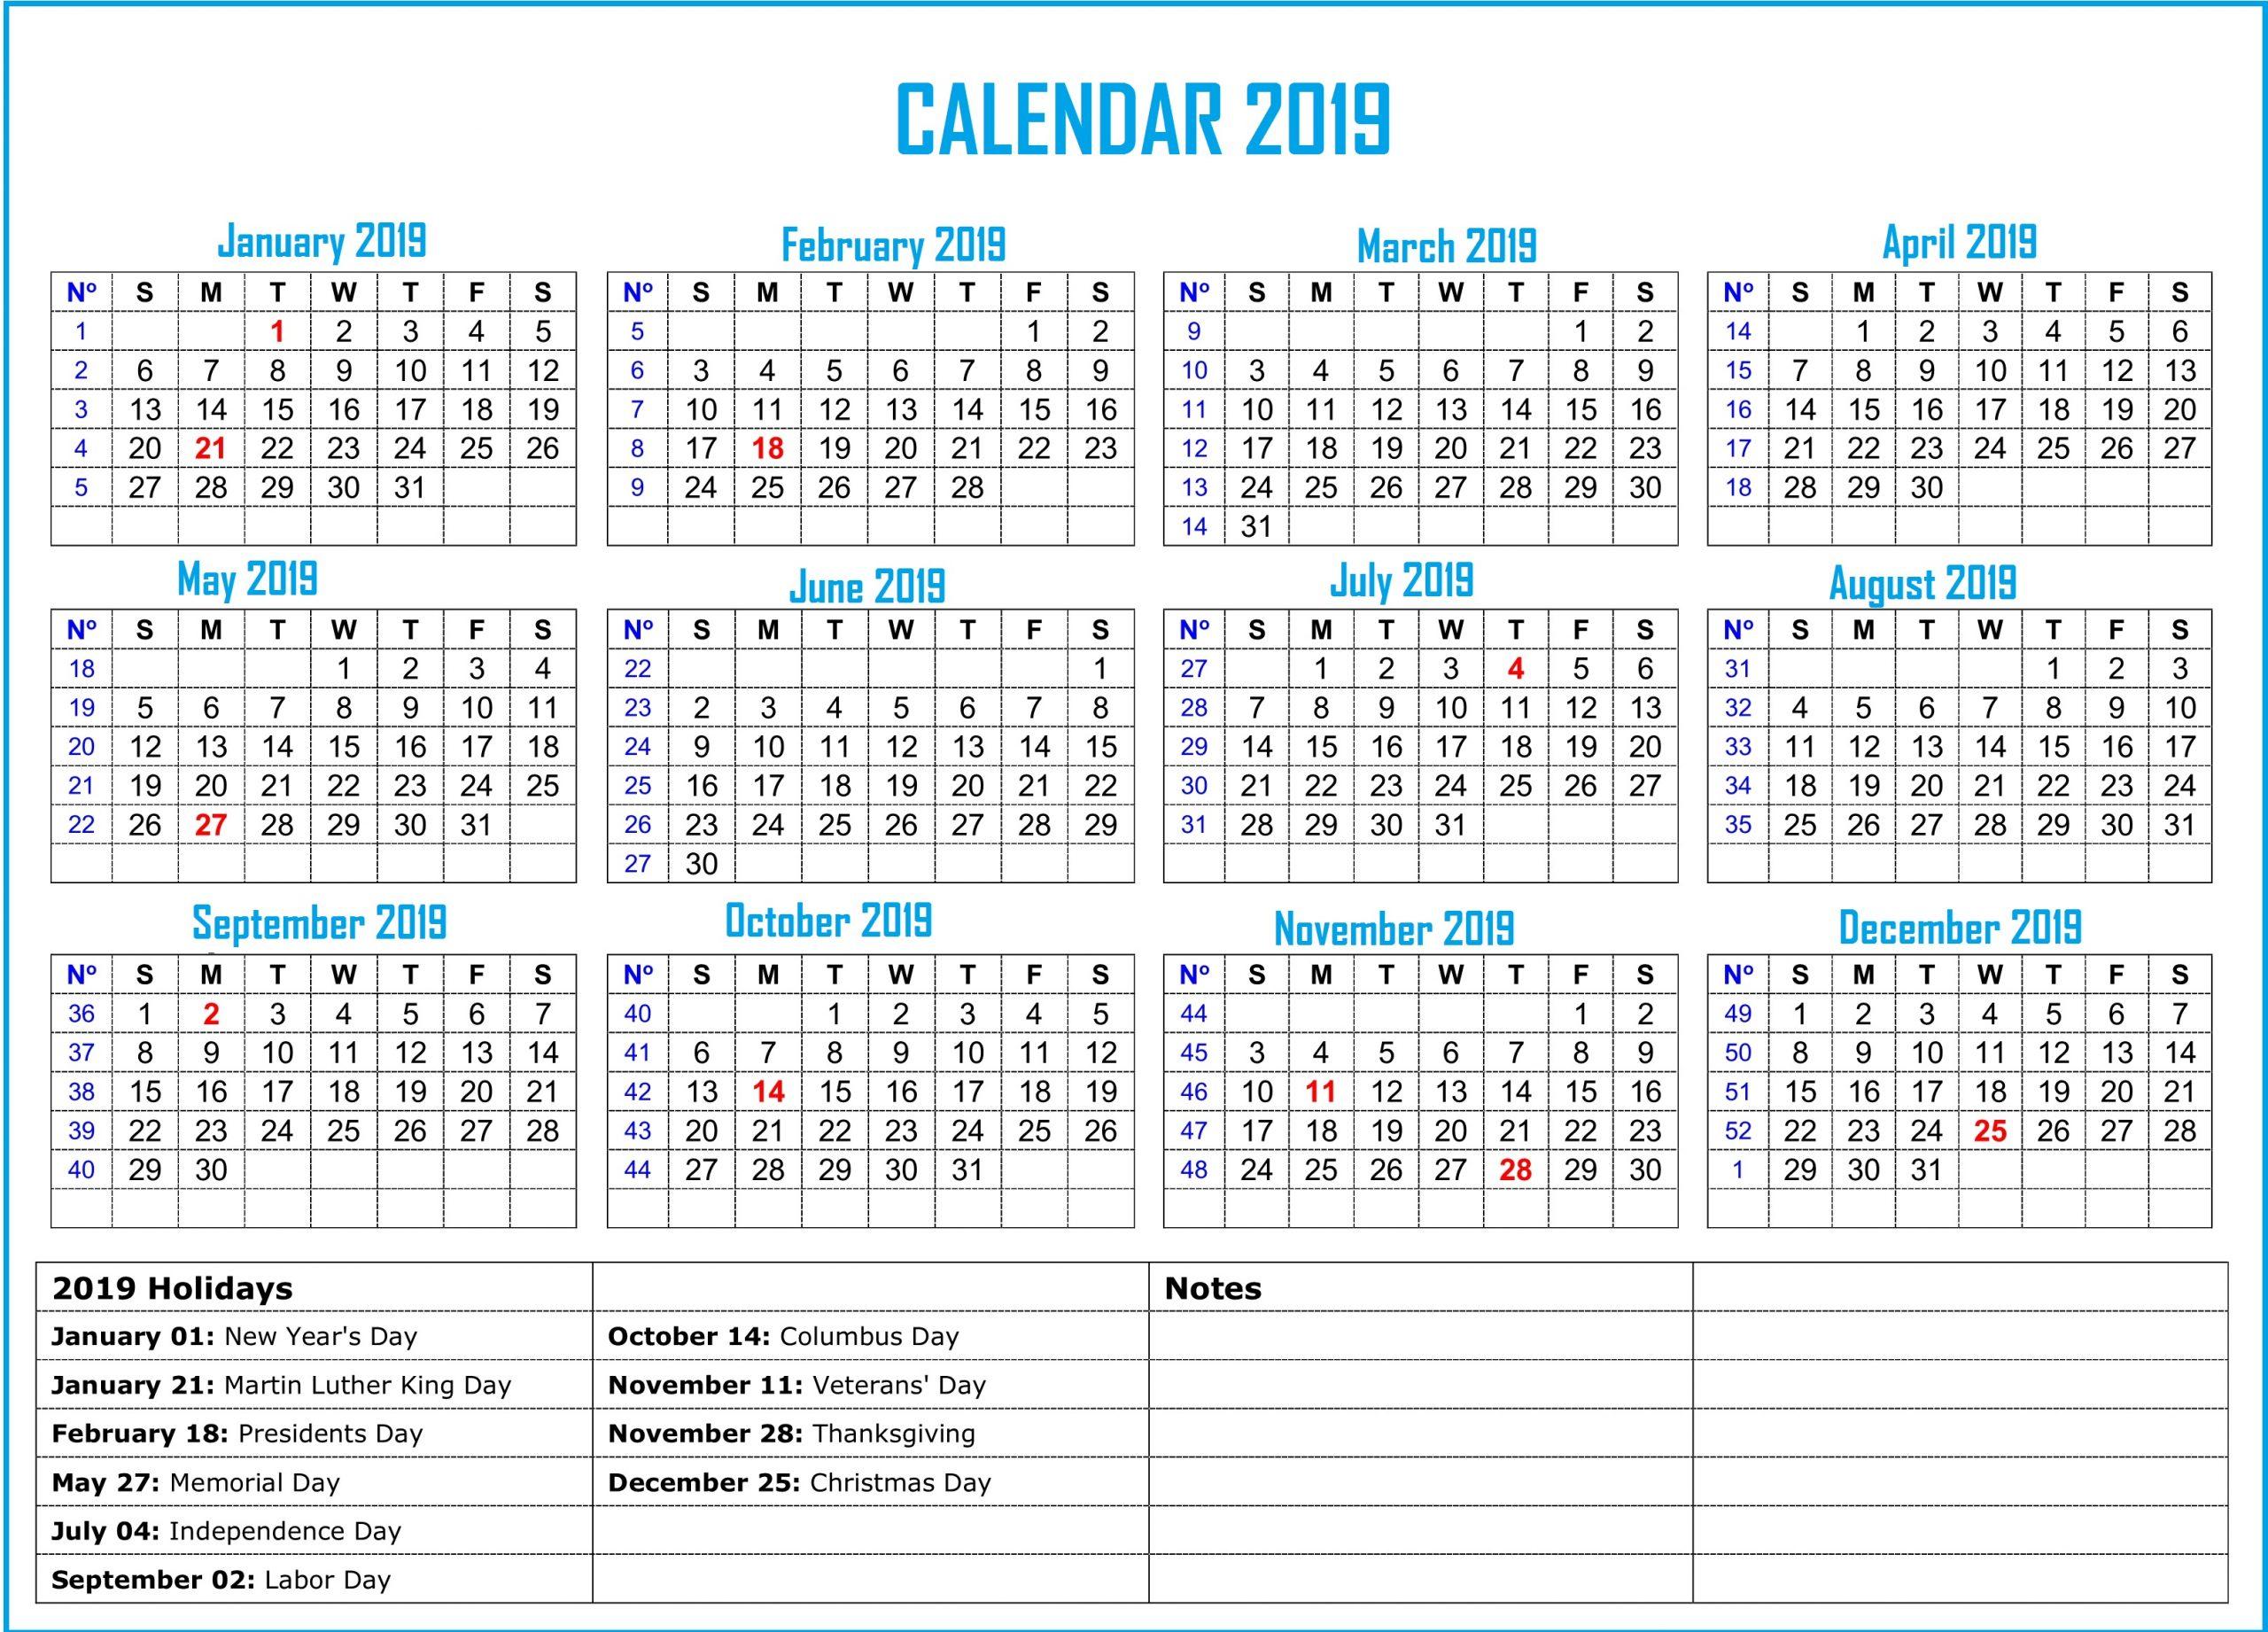 2019 Bank Holiday Calendar